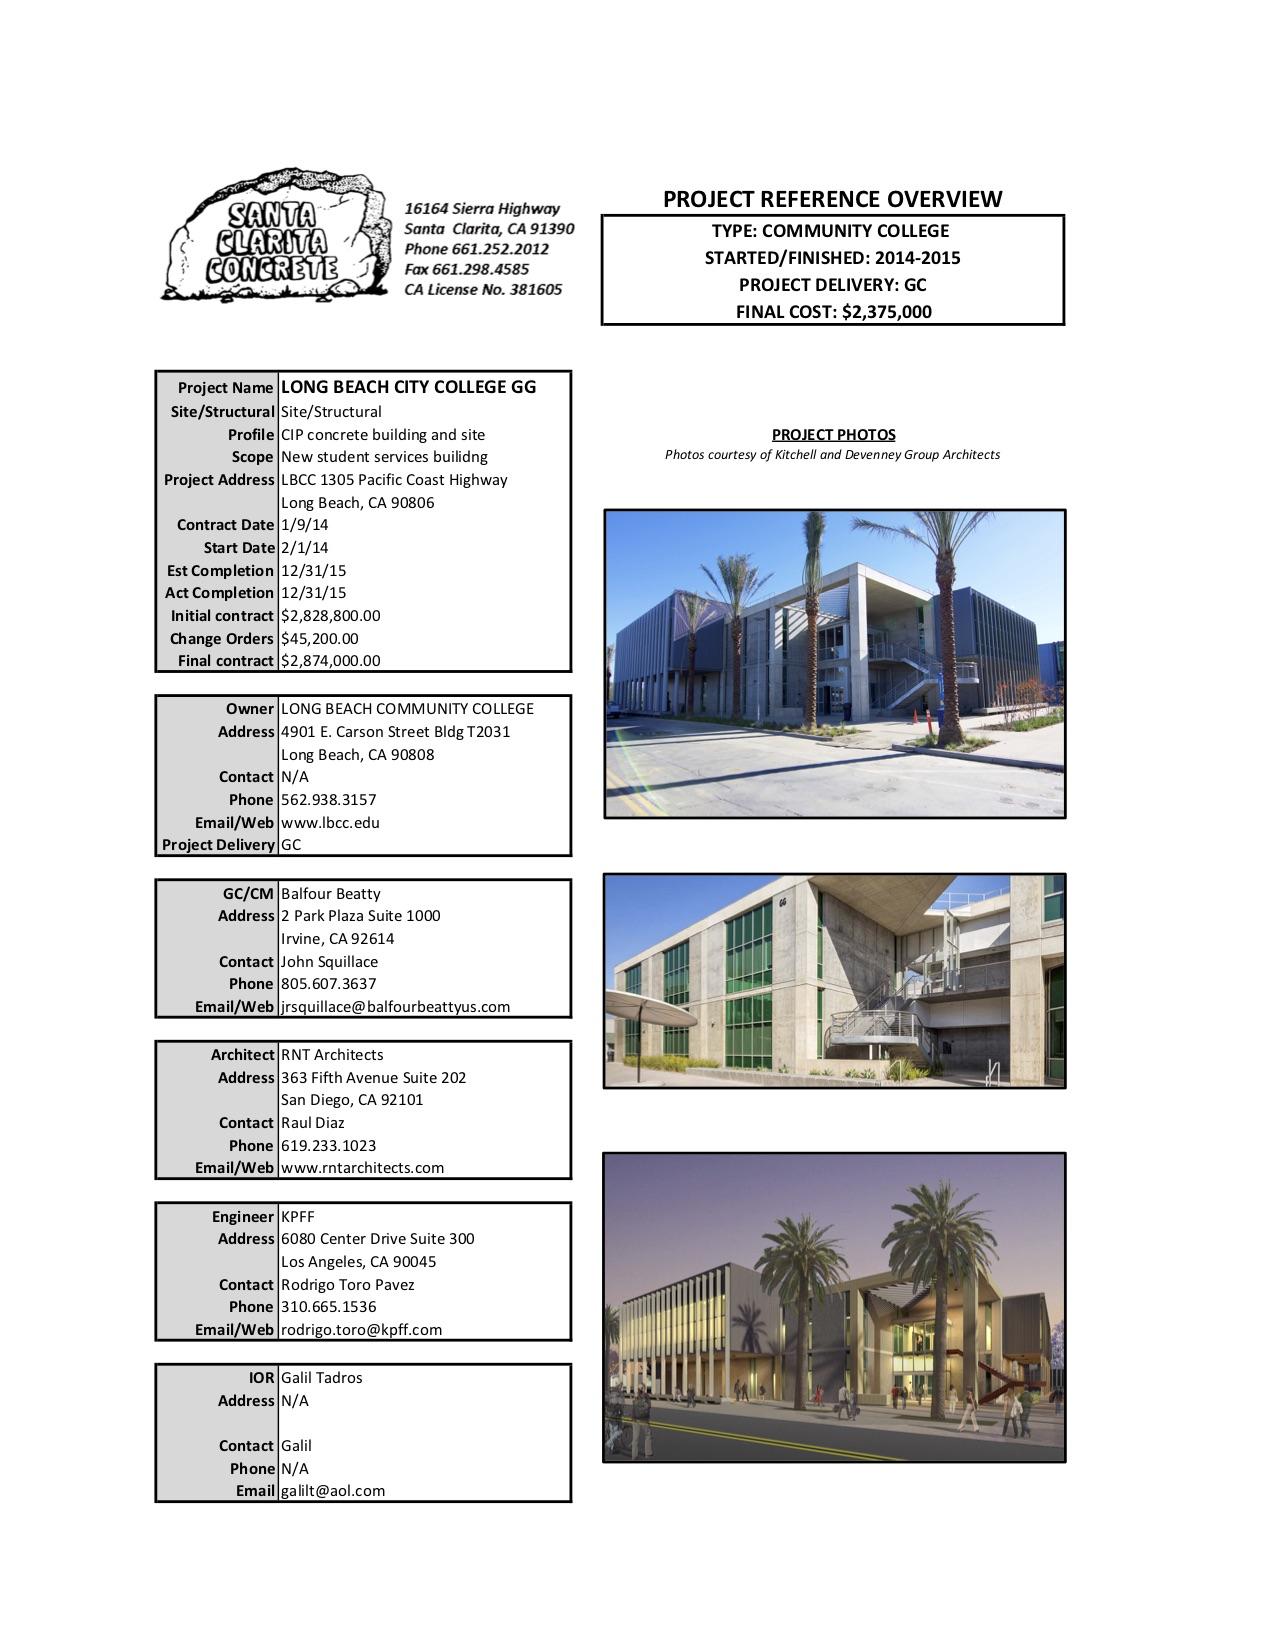 LBCC job sheet.jpg